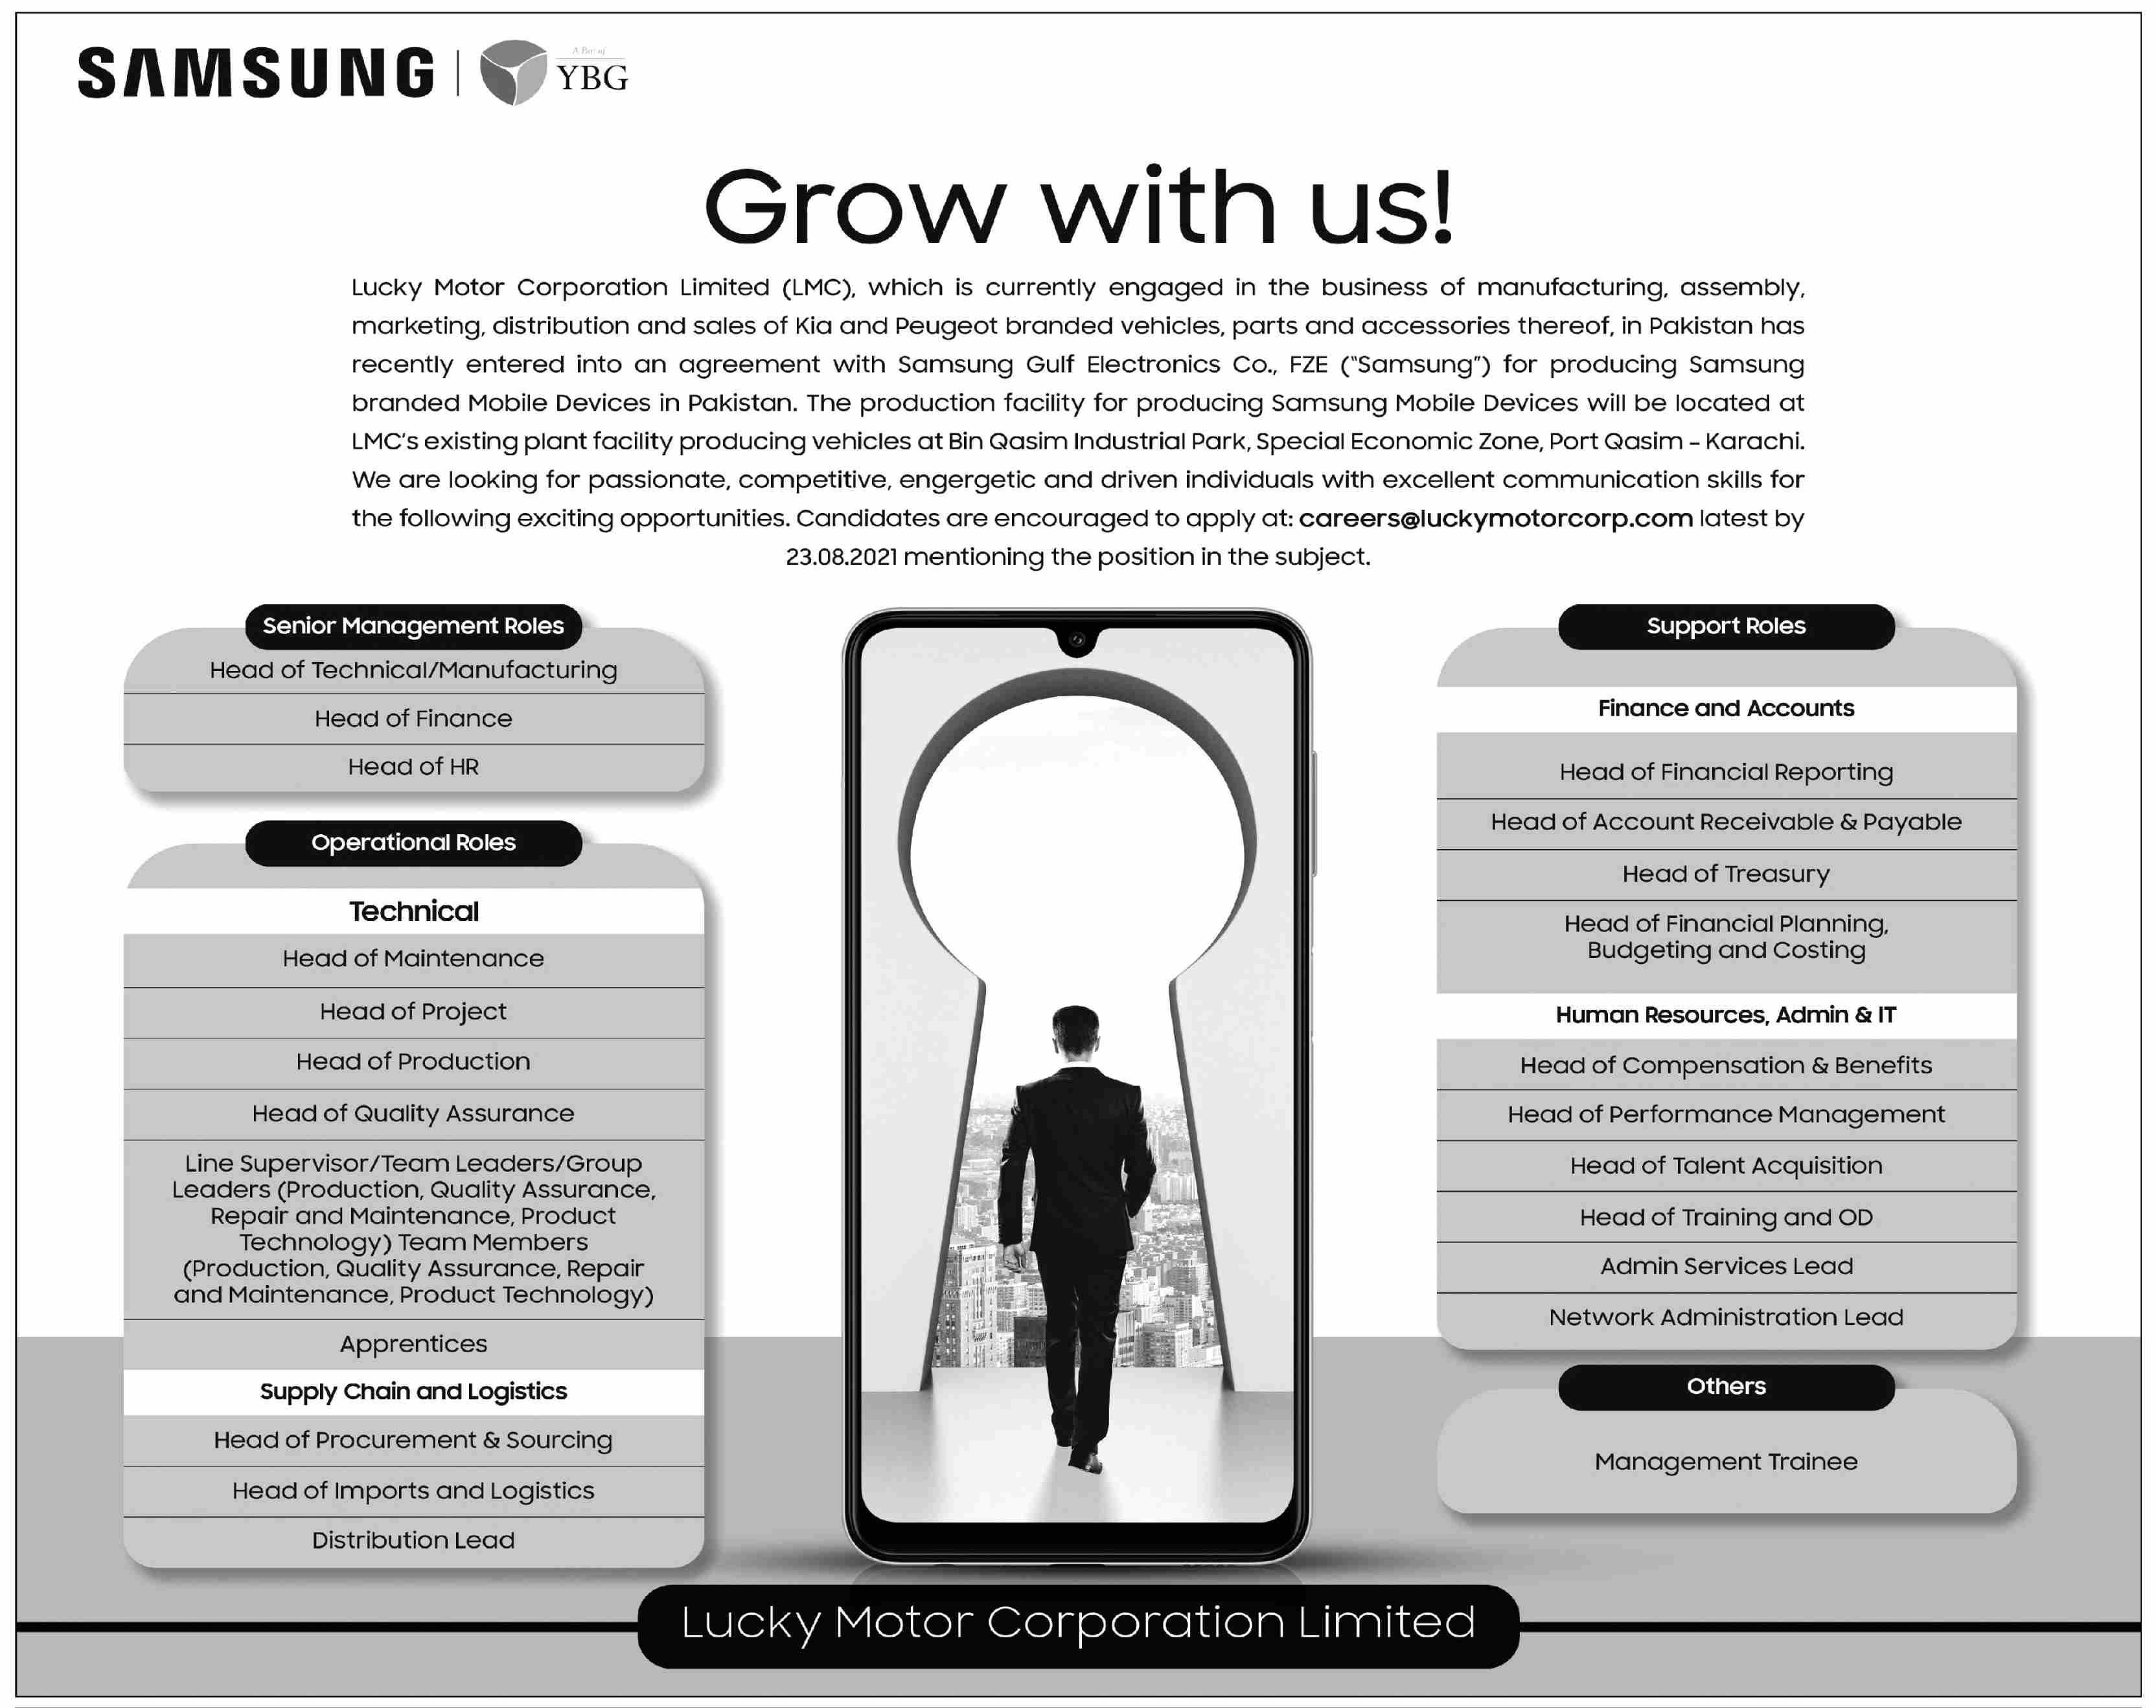 Samsung Jobs 2021 in Pakistan